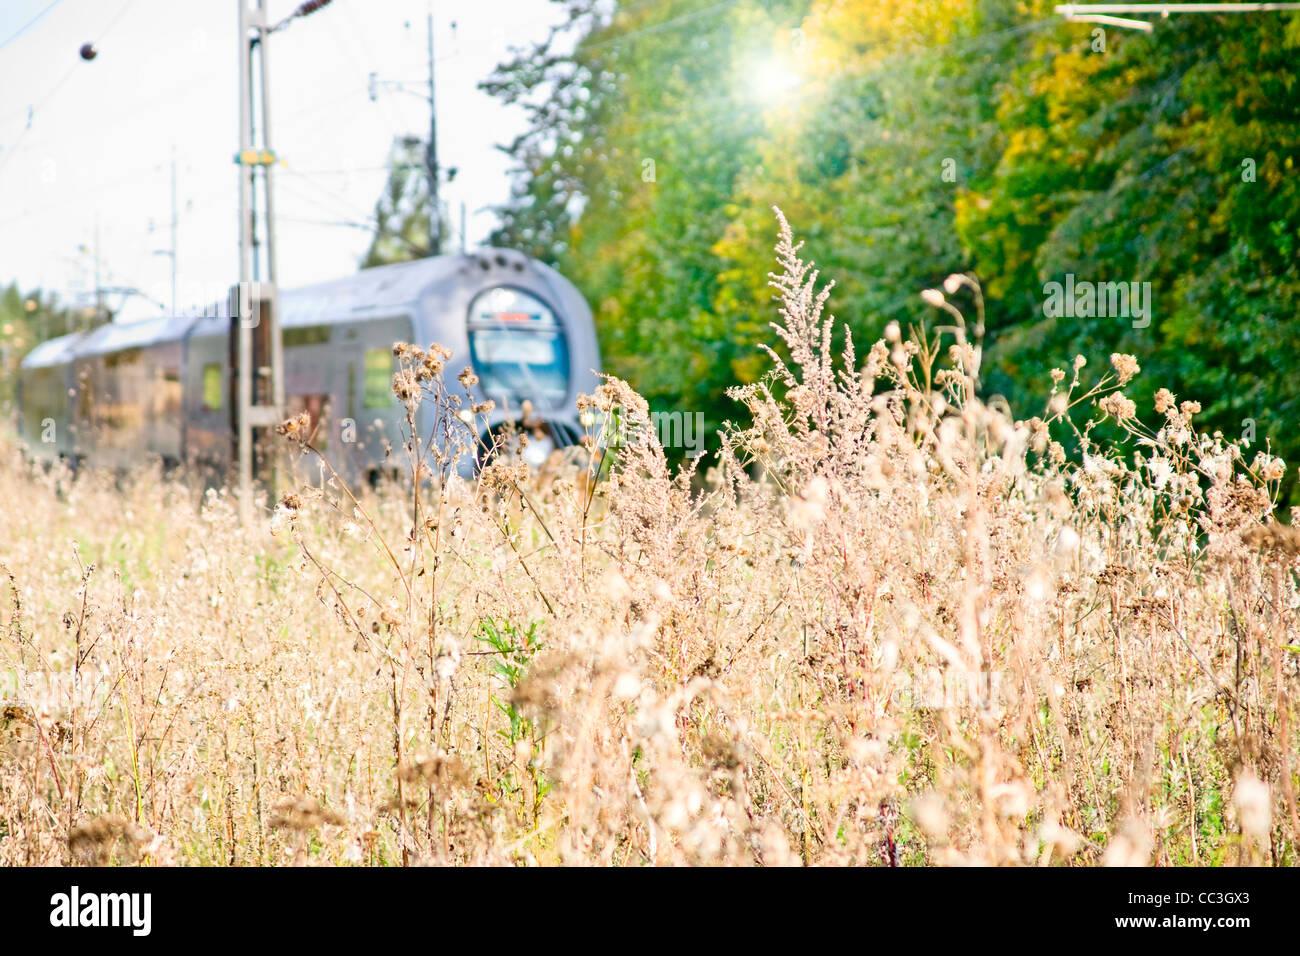 Train (motion blur) - Stock Image